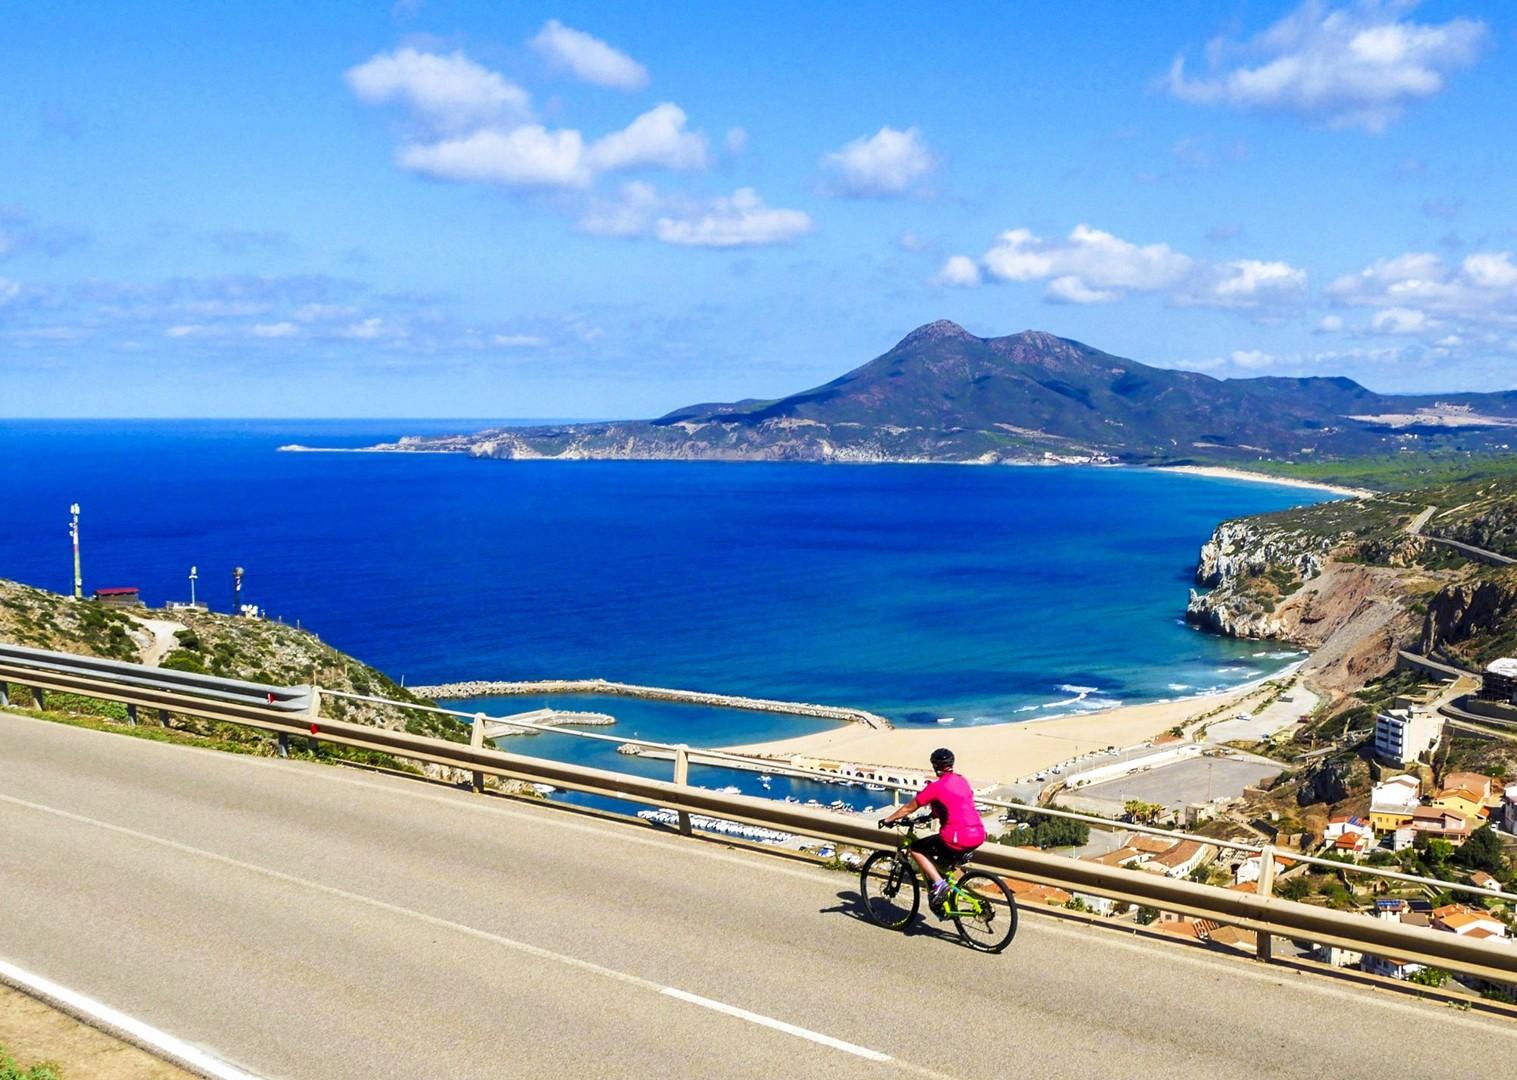 _Holiday.390.18767-2.jpg - Italy - Sardinia - Island Flavours - Italia Leisure and Family Cycling